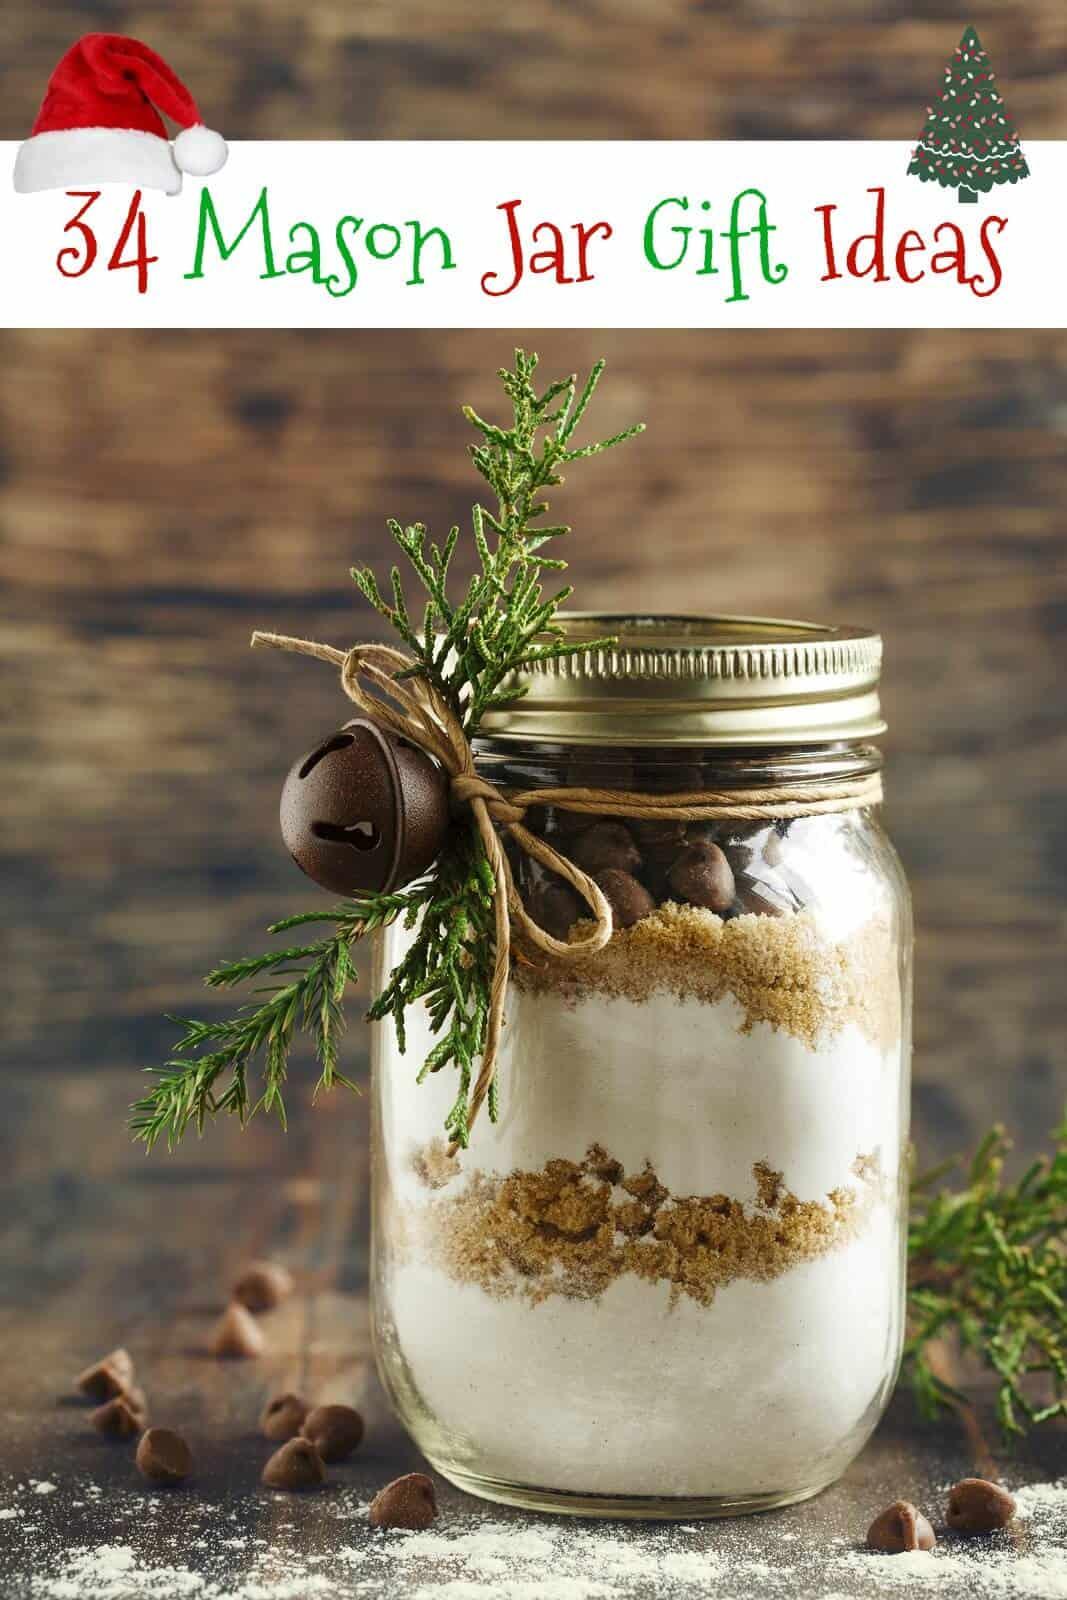 34 Diy Mason Jar Gift Ideas Healthy Living In Body And Mind